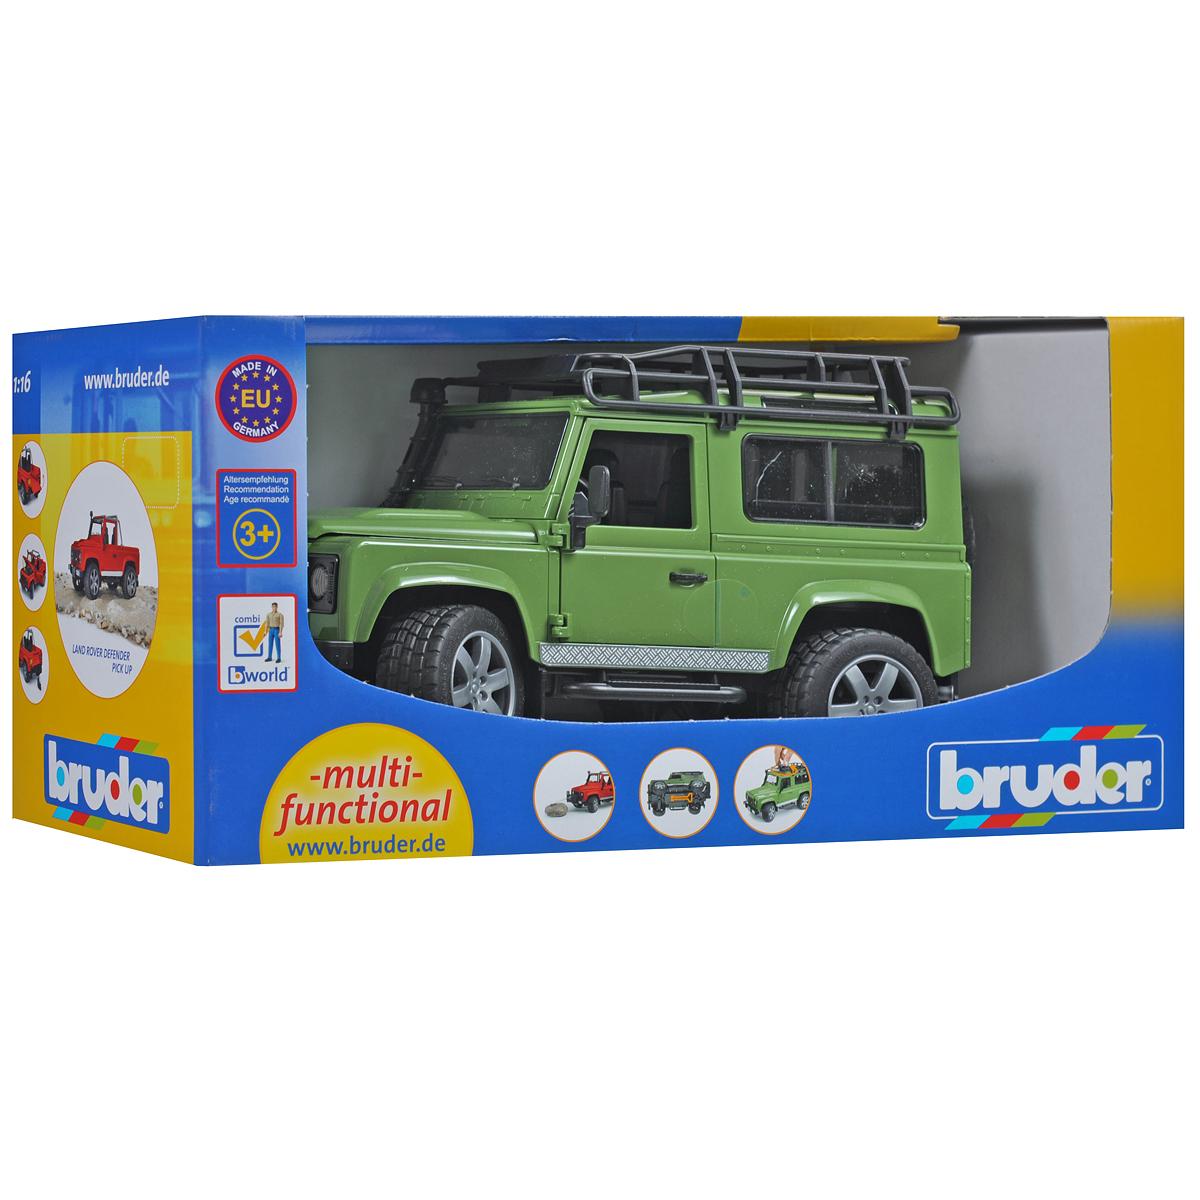 Bruder Внедорожник Land Rover Defender цвет зеленый